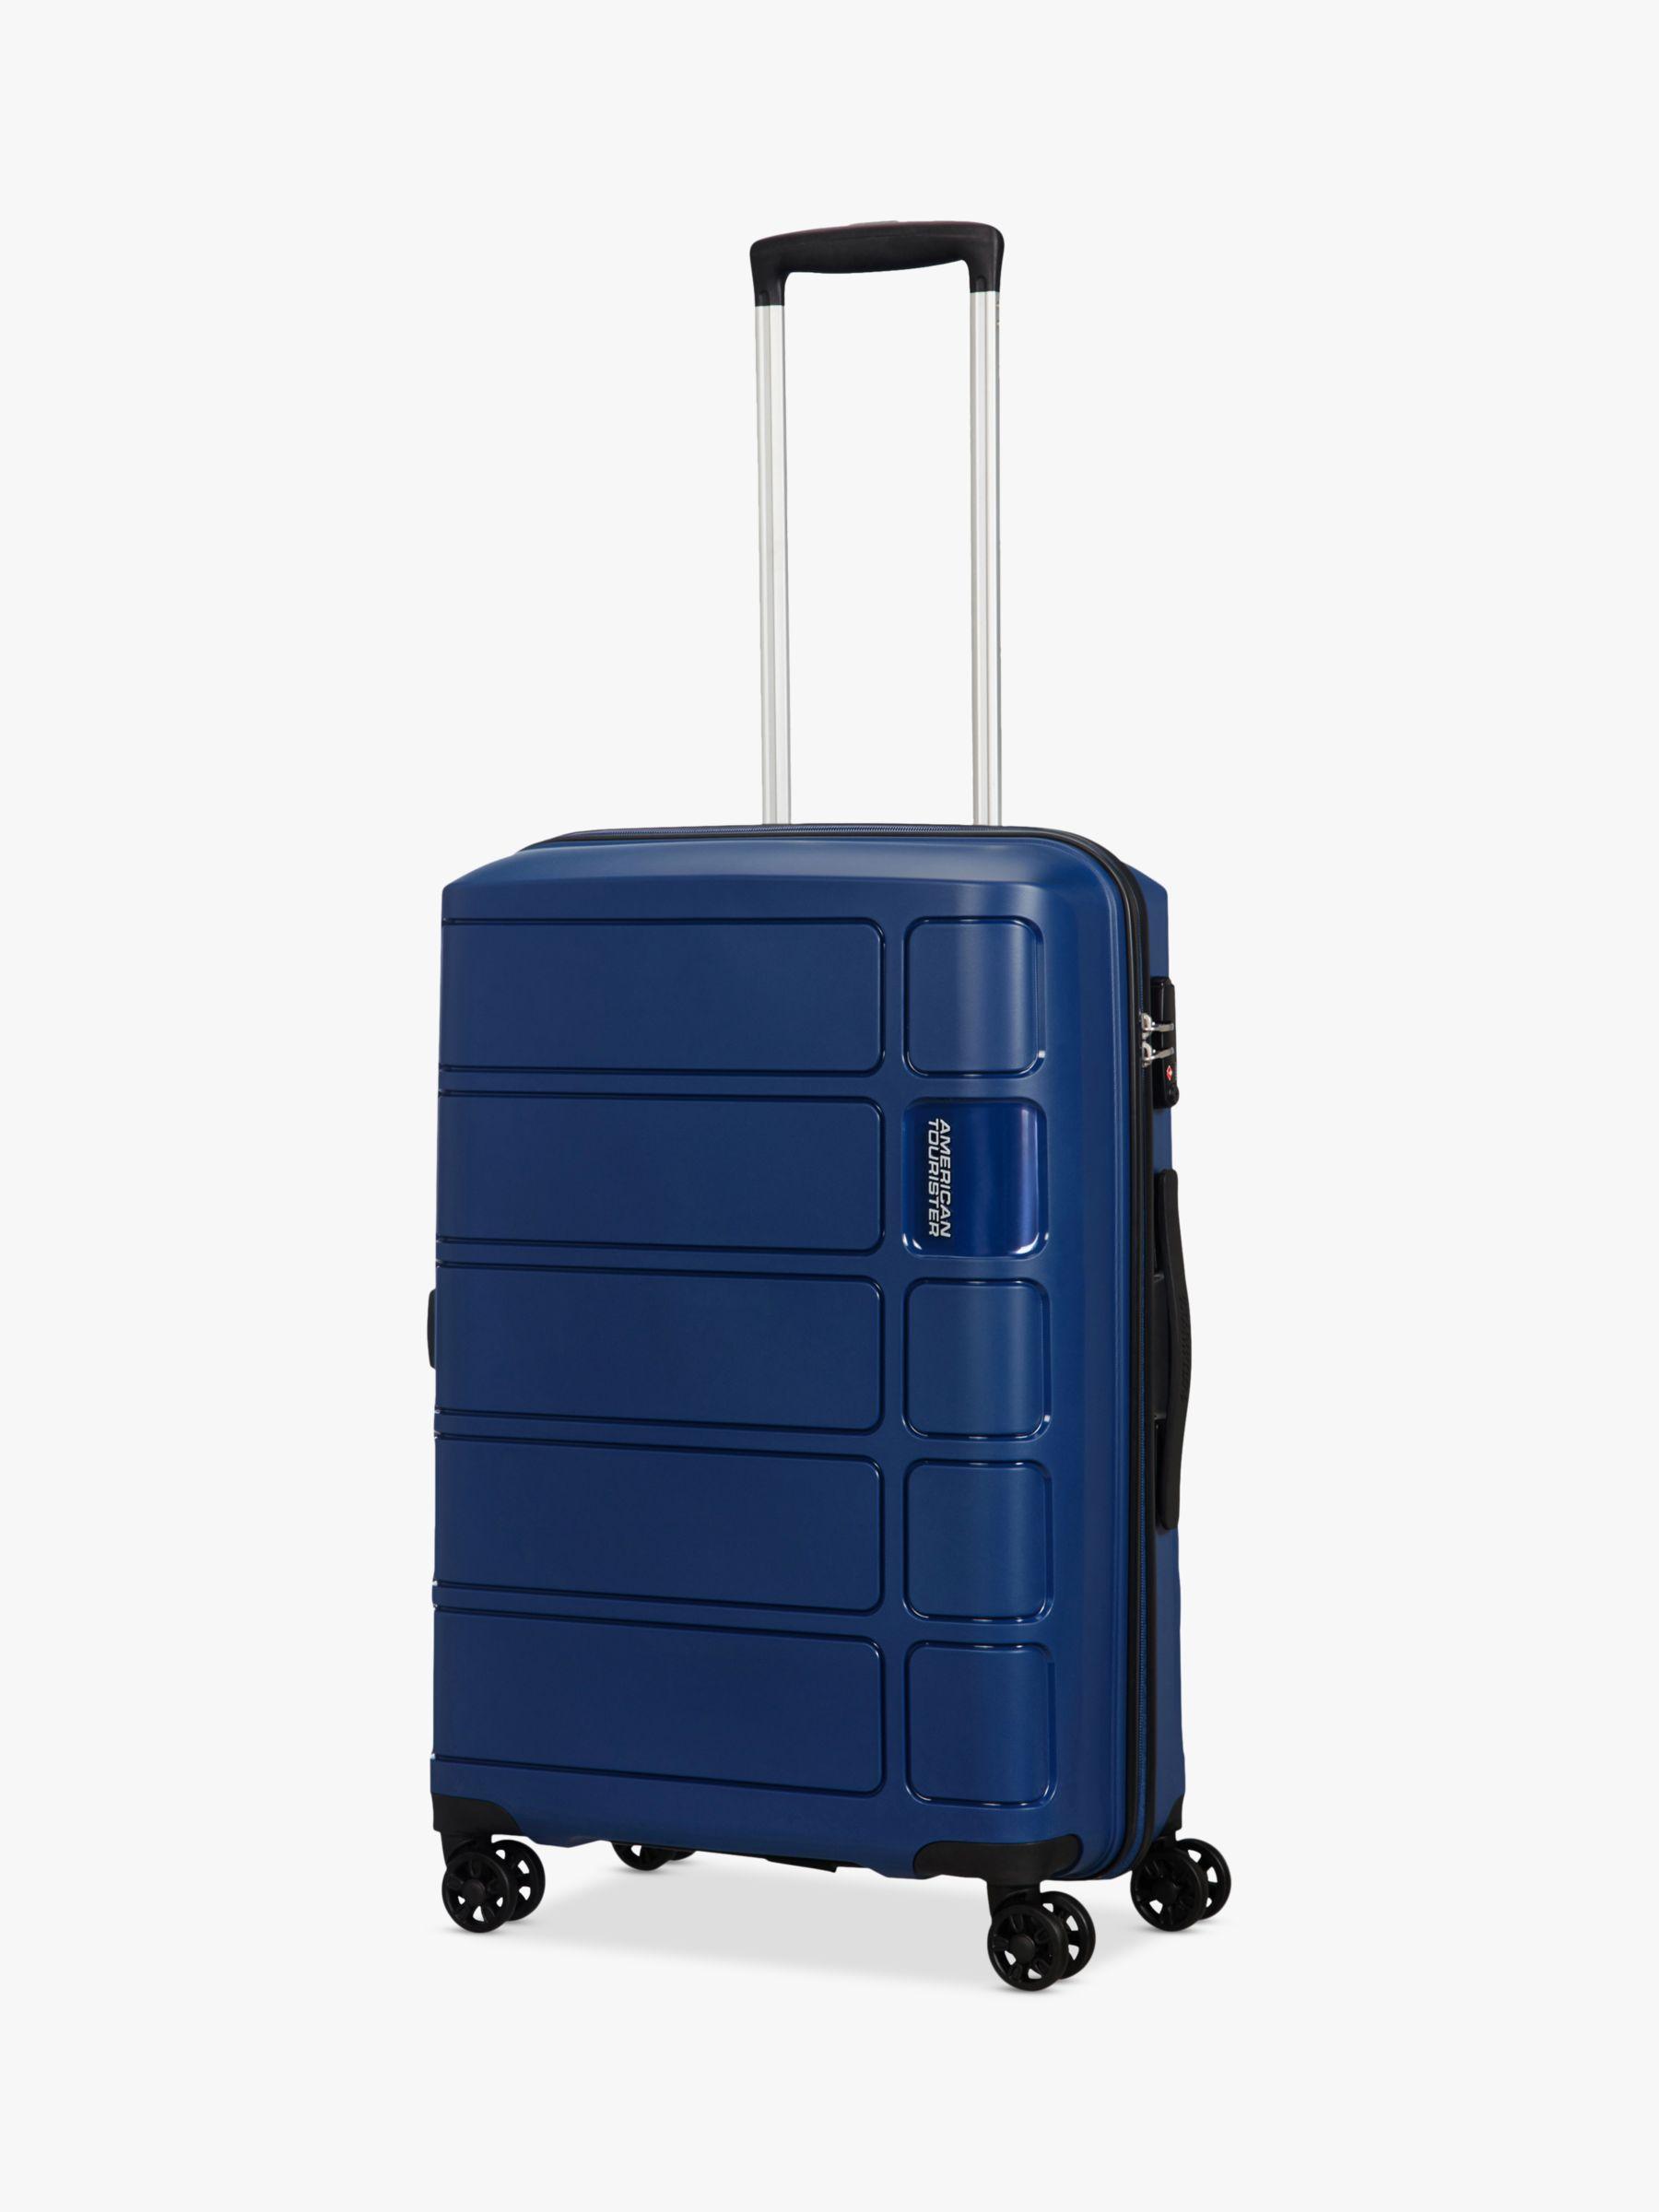 American Tourister American Tourister Summer Splash 4-Wheel 67cm Medium Case